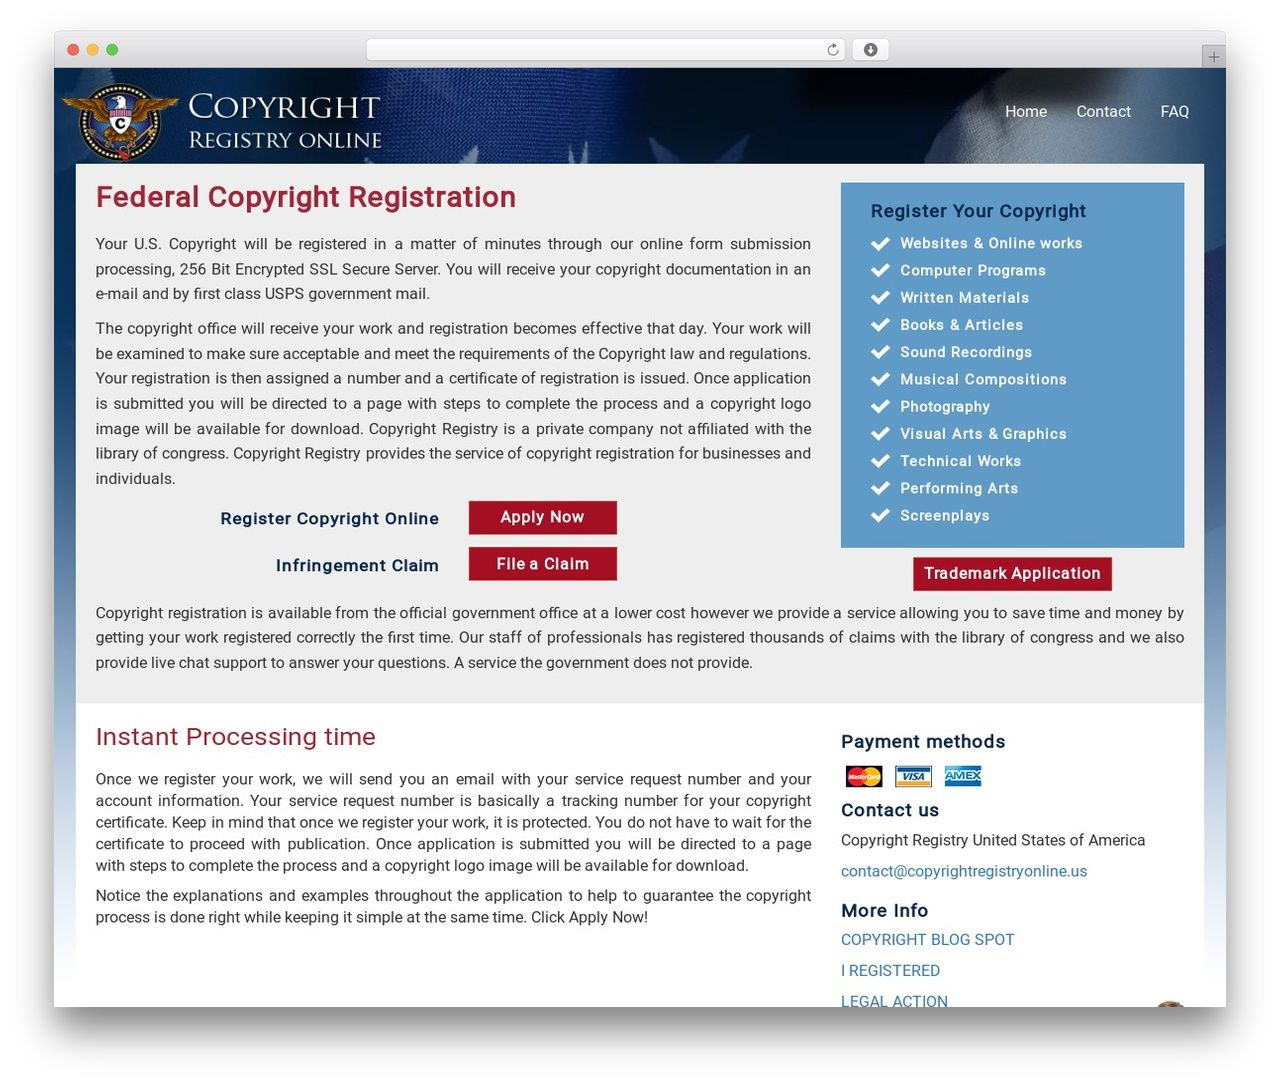 Copyright Wordpress Theme Copyrightregistry Online Form Com Wordpress Wordpress Theme Online